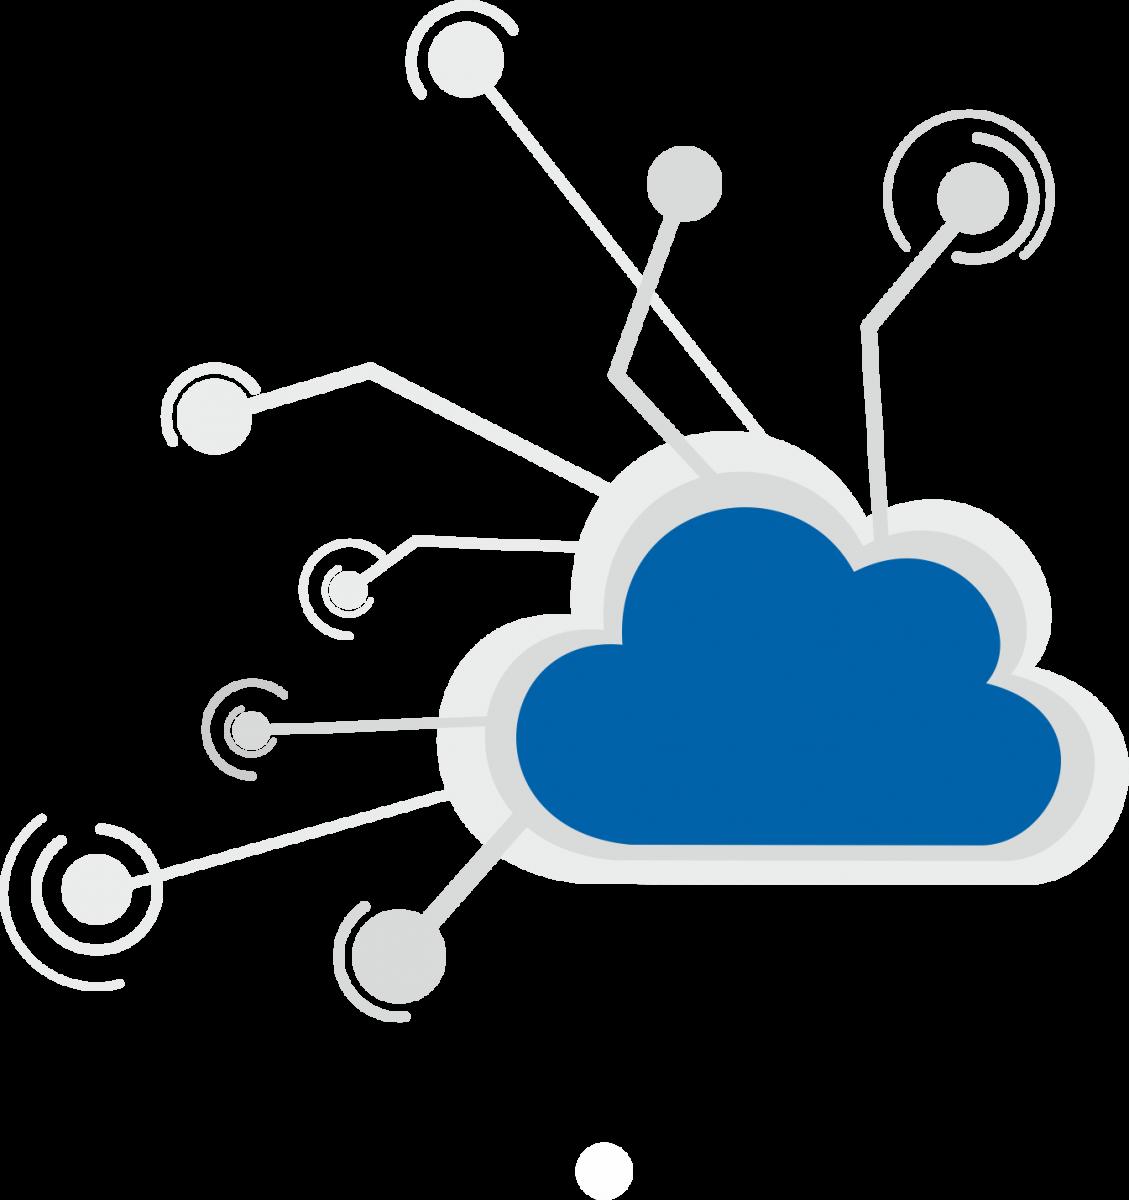 software-360°-Wolke